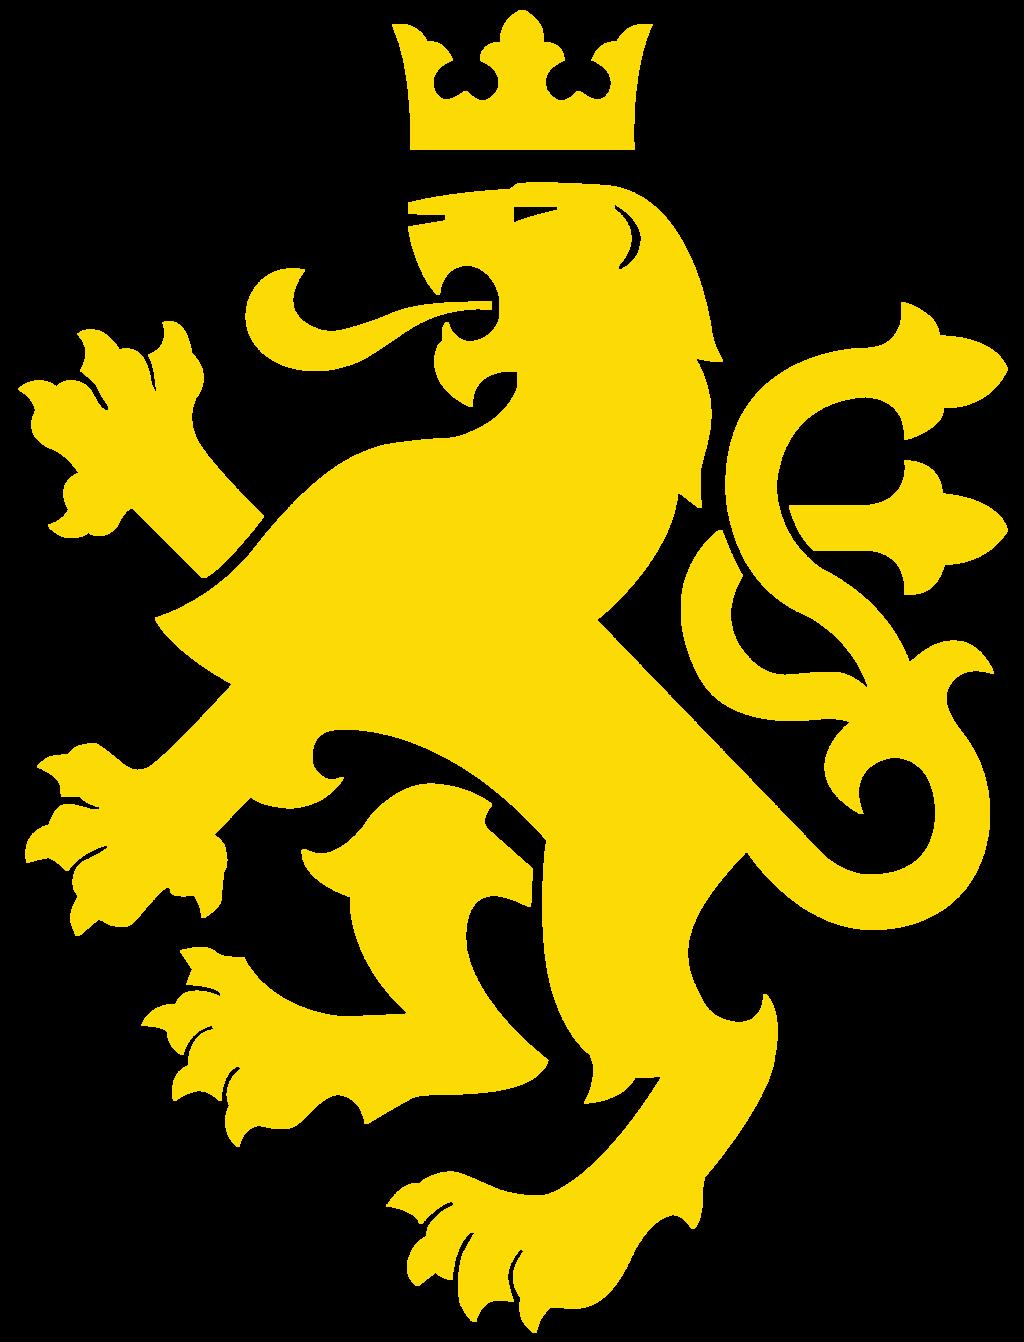 Golden logo google search. Clipart shield lion